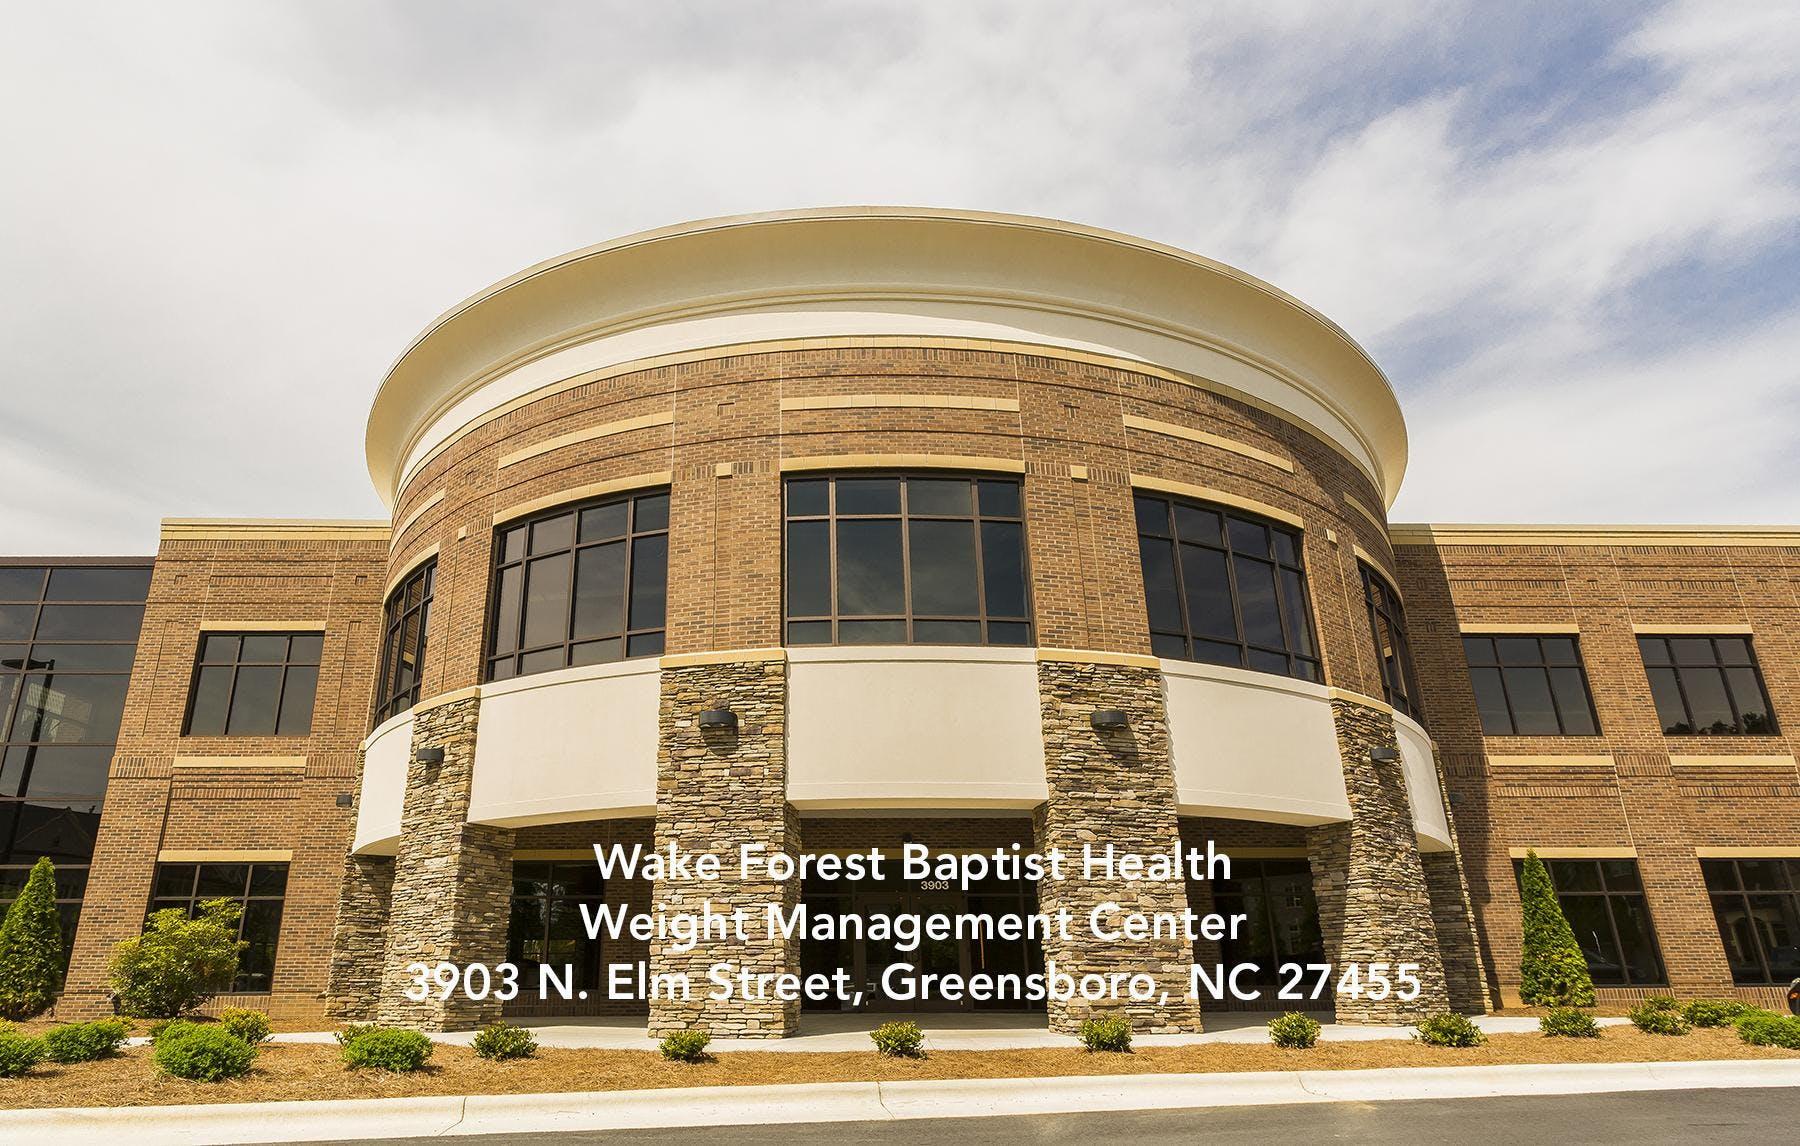 Wake Forest Baptist Health Weight Management